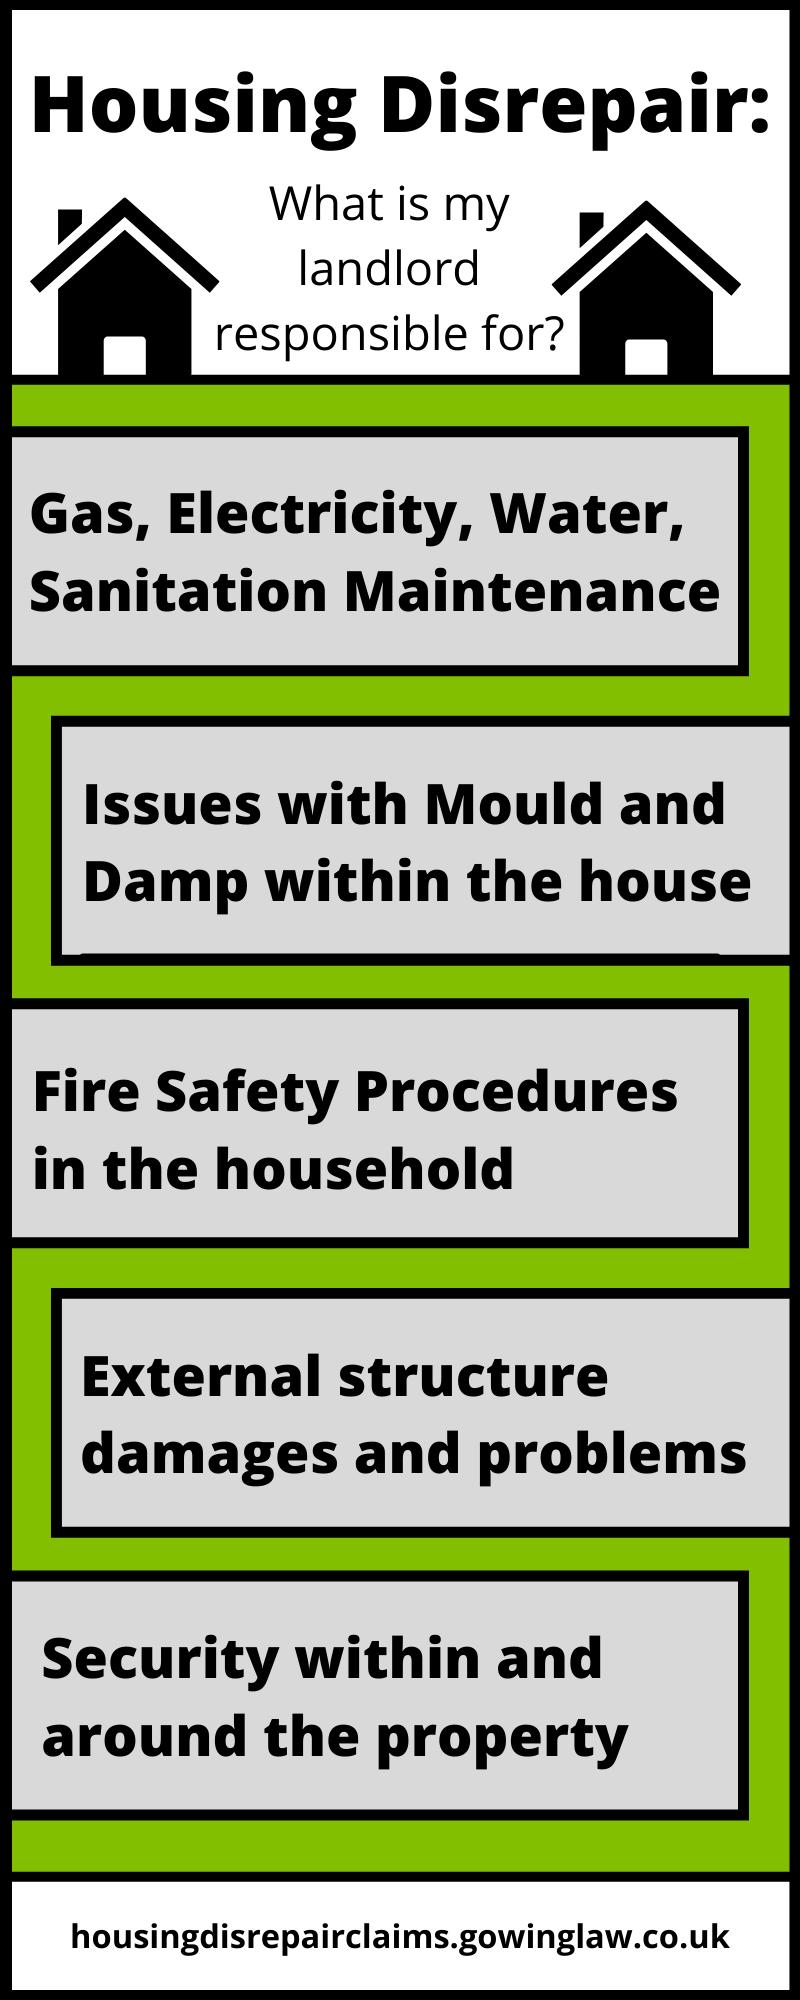 Housing Disrepair Claims Infographic